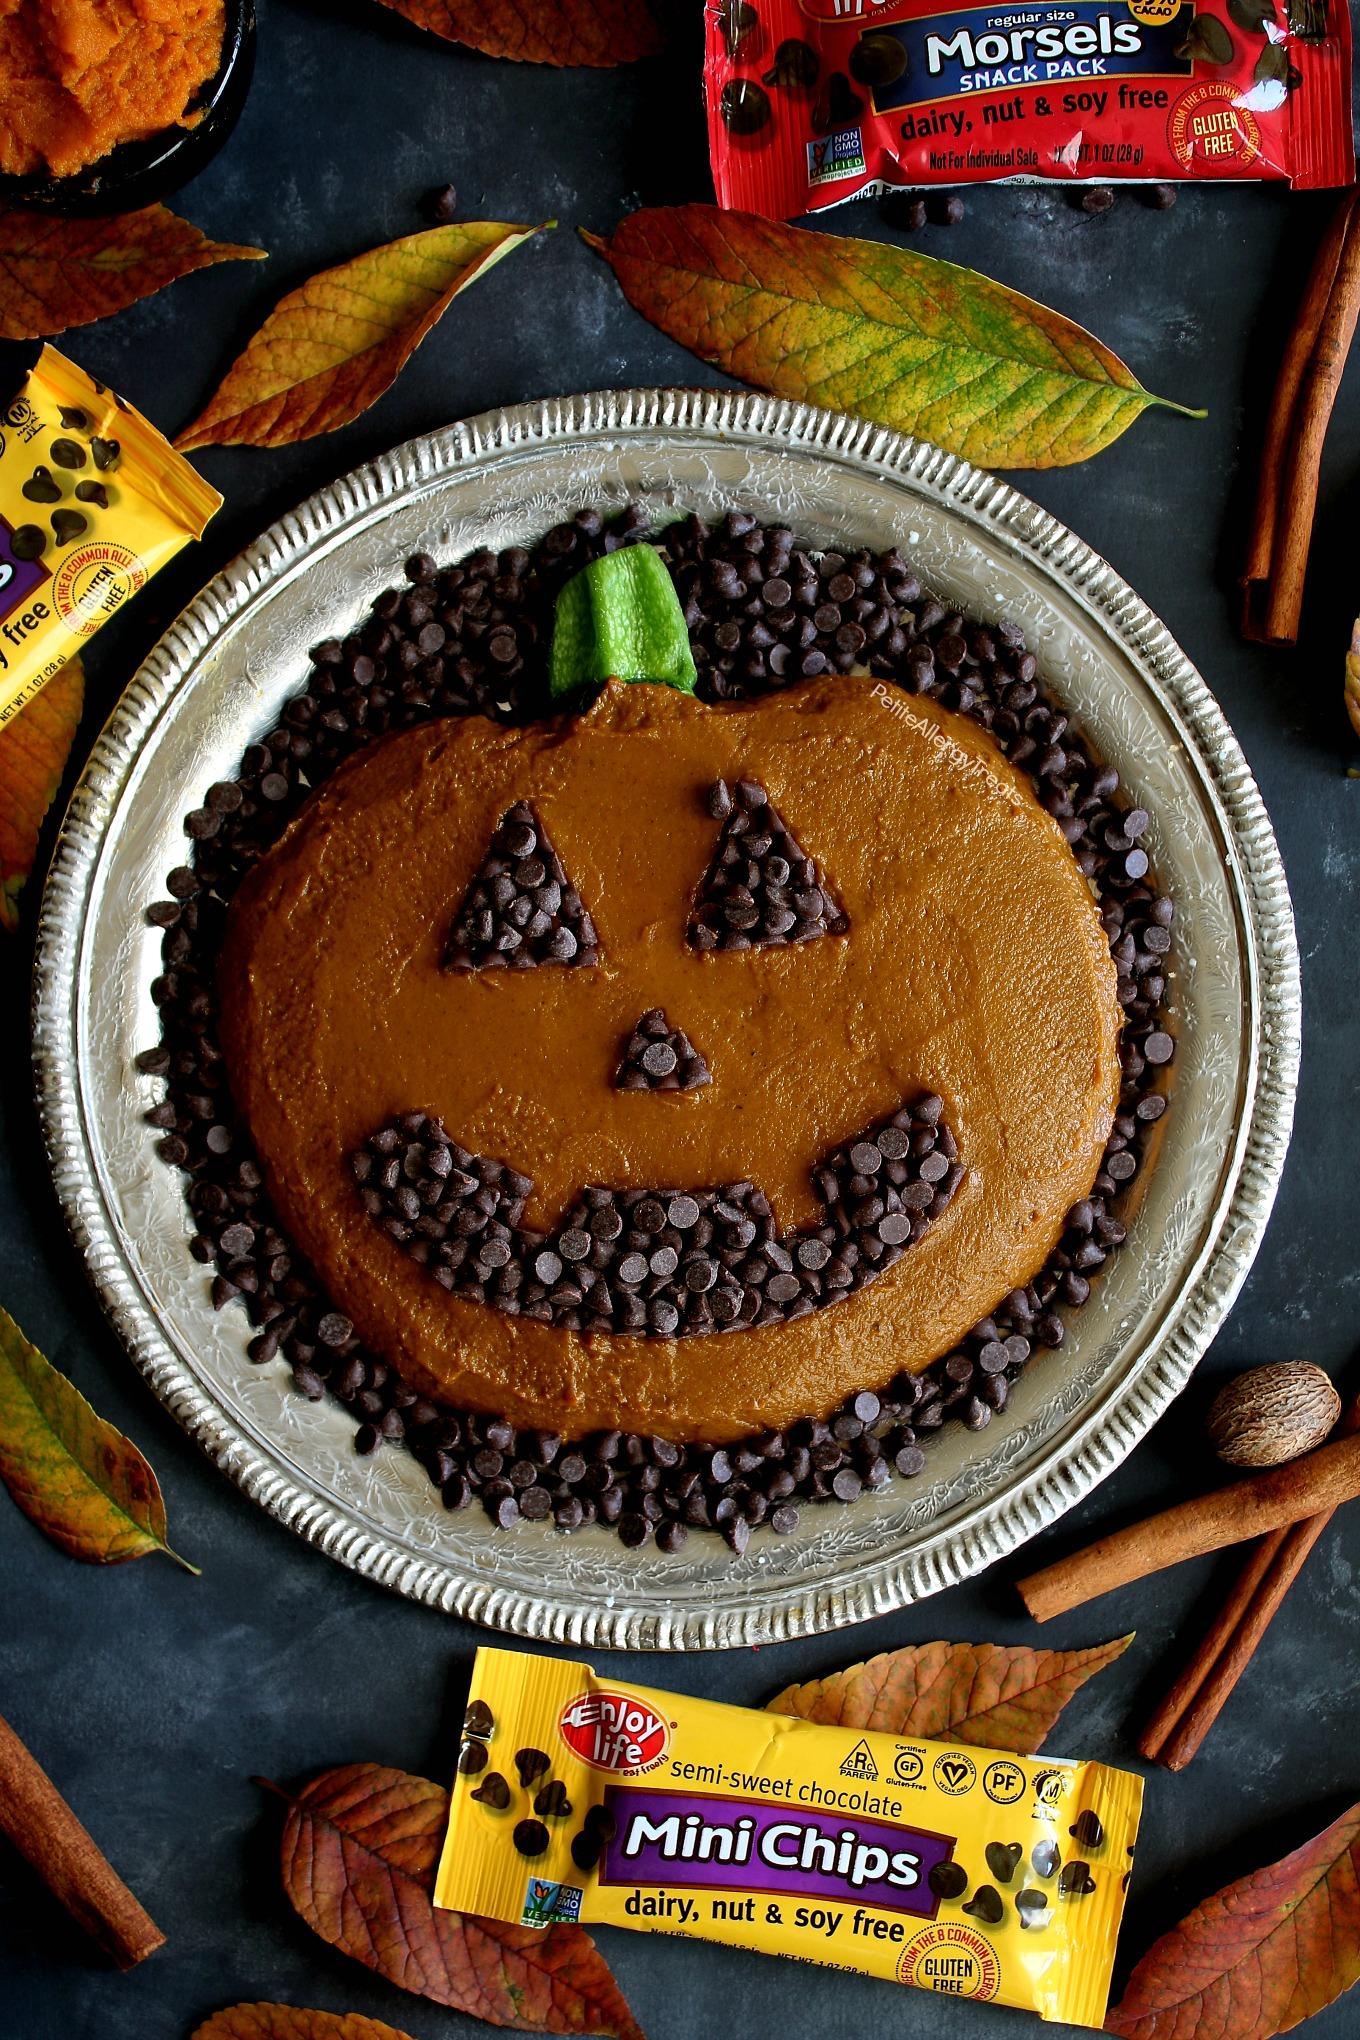 Skinny Dairy Free Pumpkin Platter Dip Recipe (vegan)- Adorable pumpkin pie dip for Fall, Halloween or Autumn parties! Food Allergy friendly!